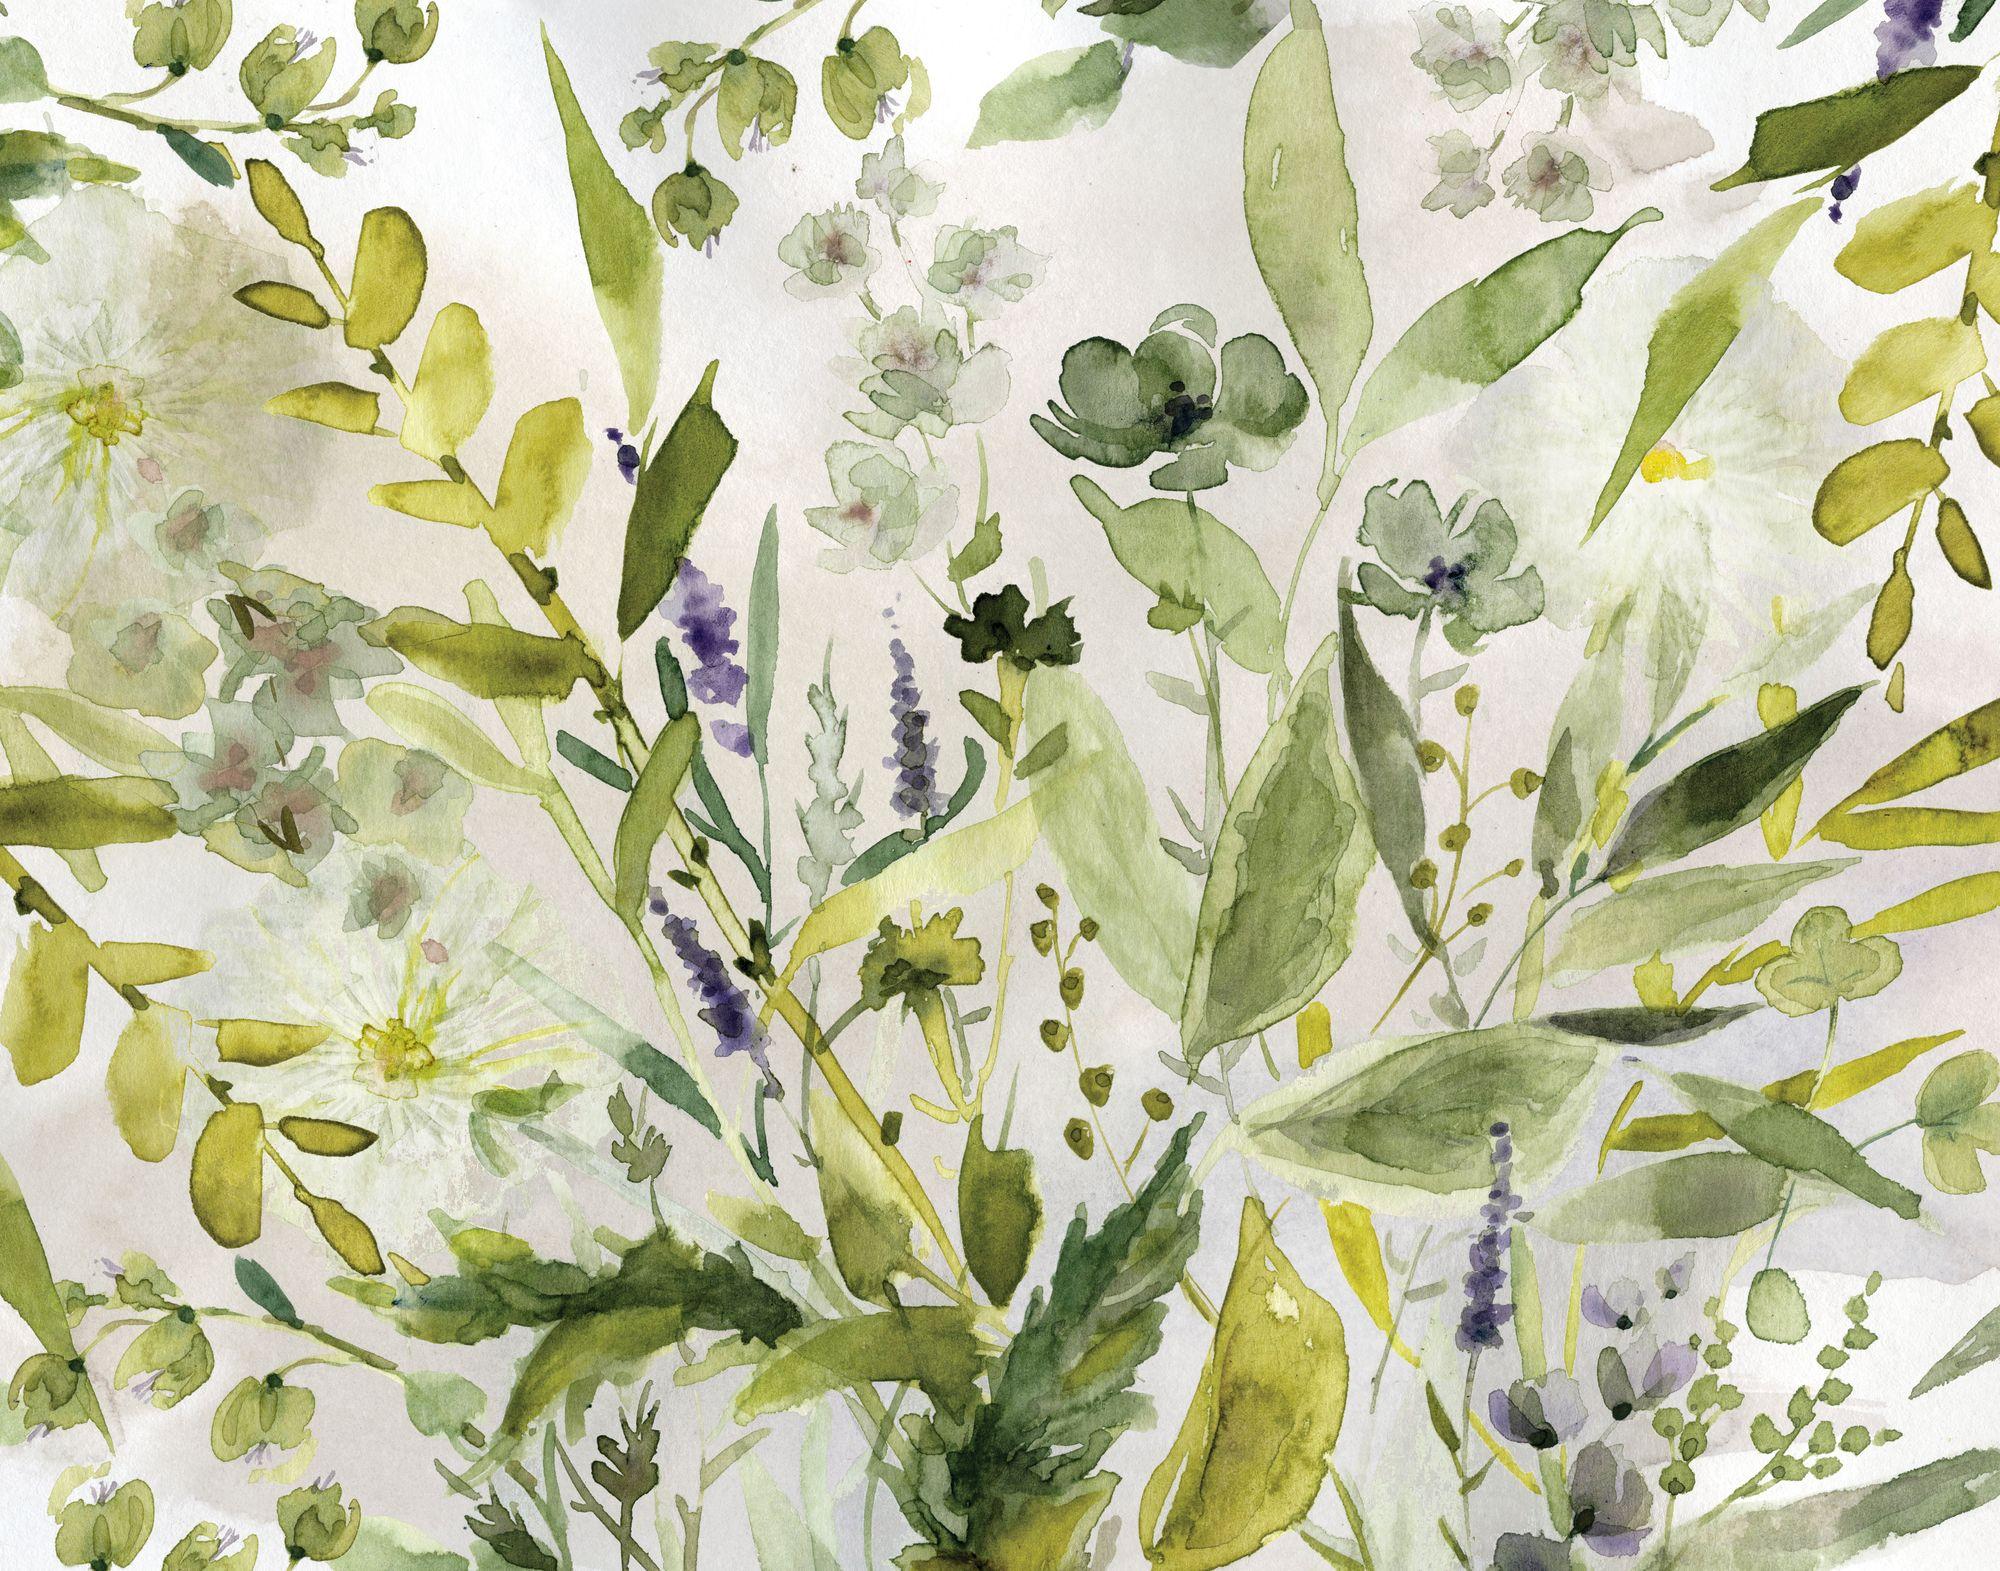 Olive Green Plants Wallpaper by Carol Robinson Wallsauce